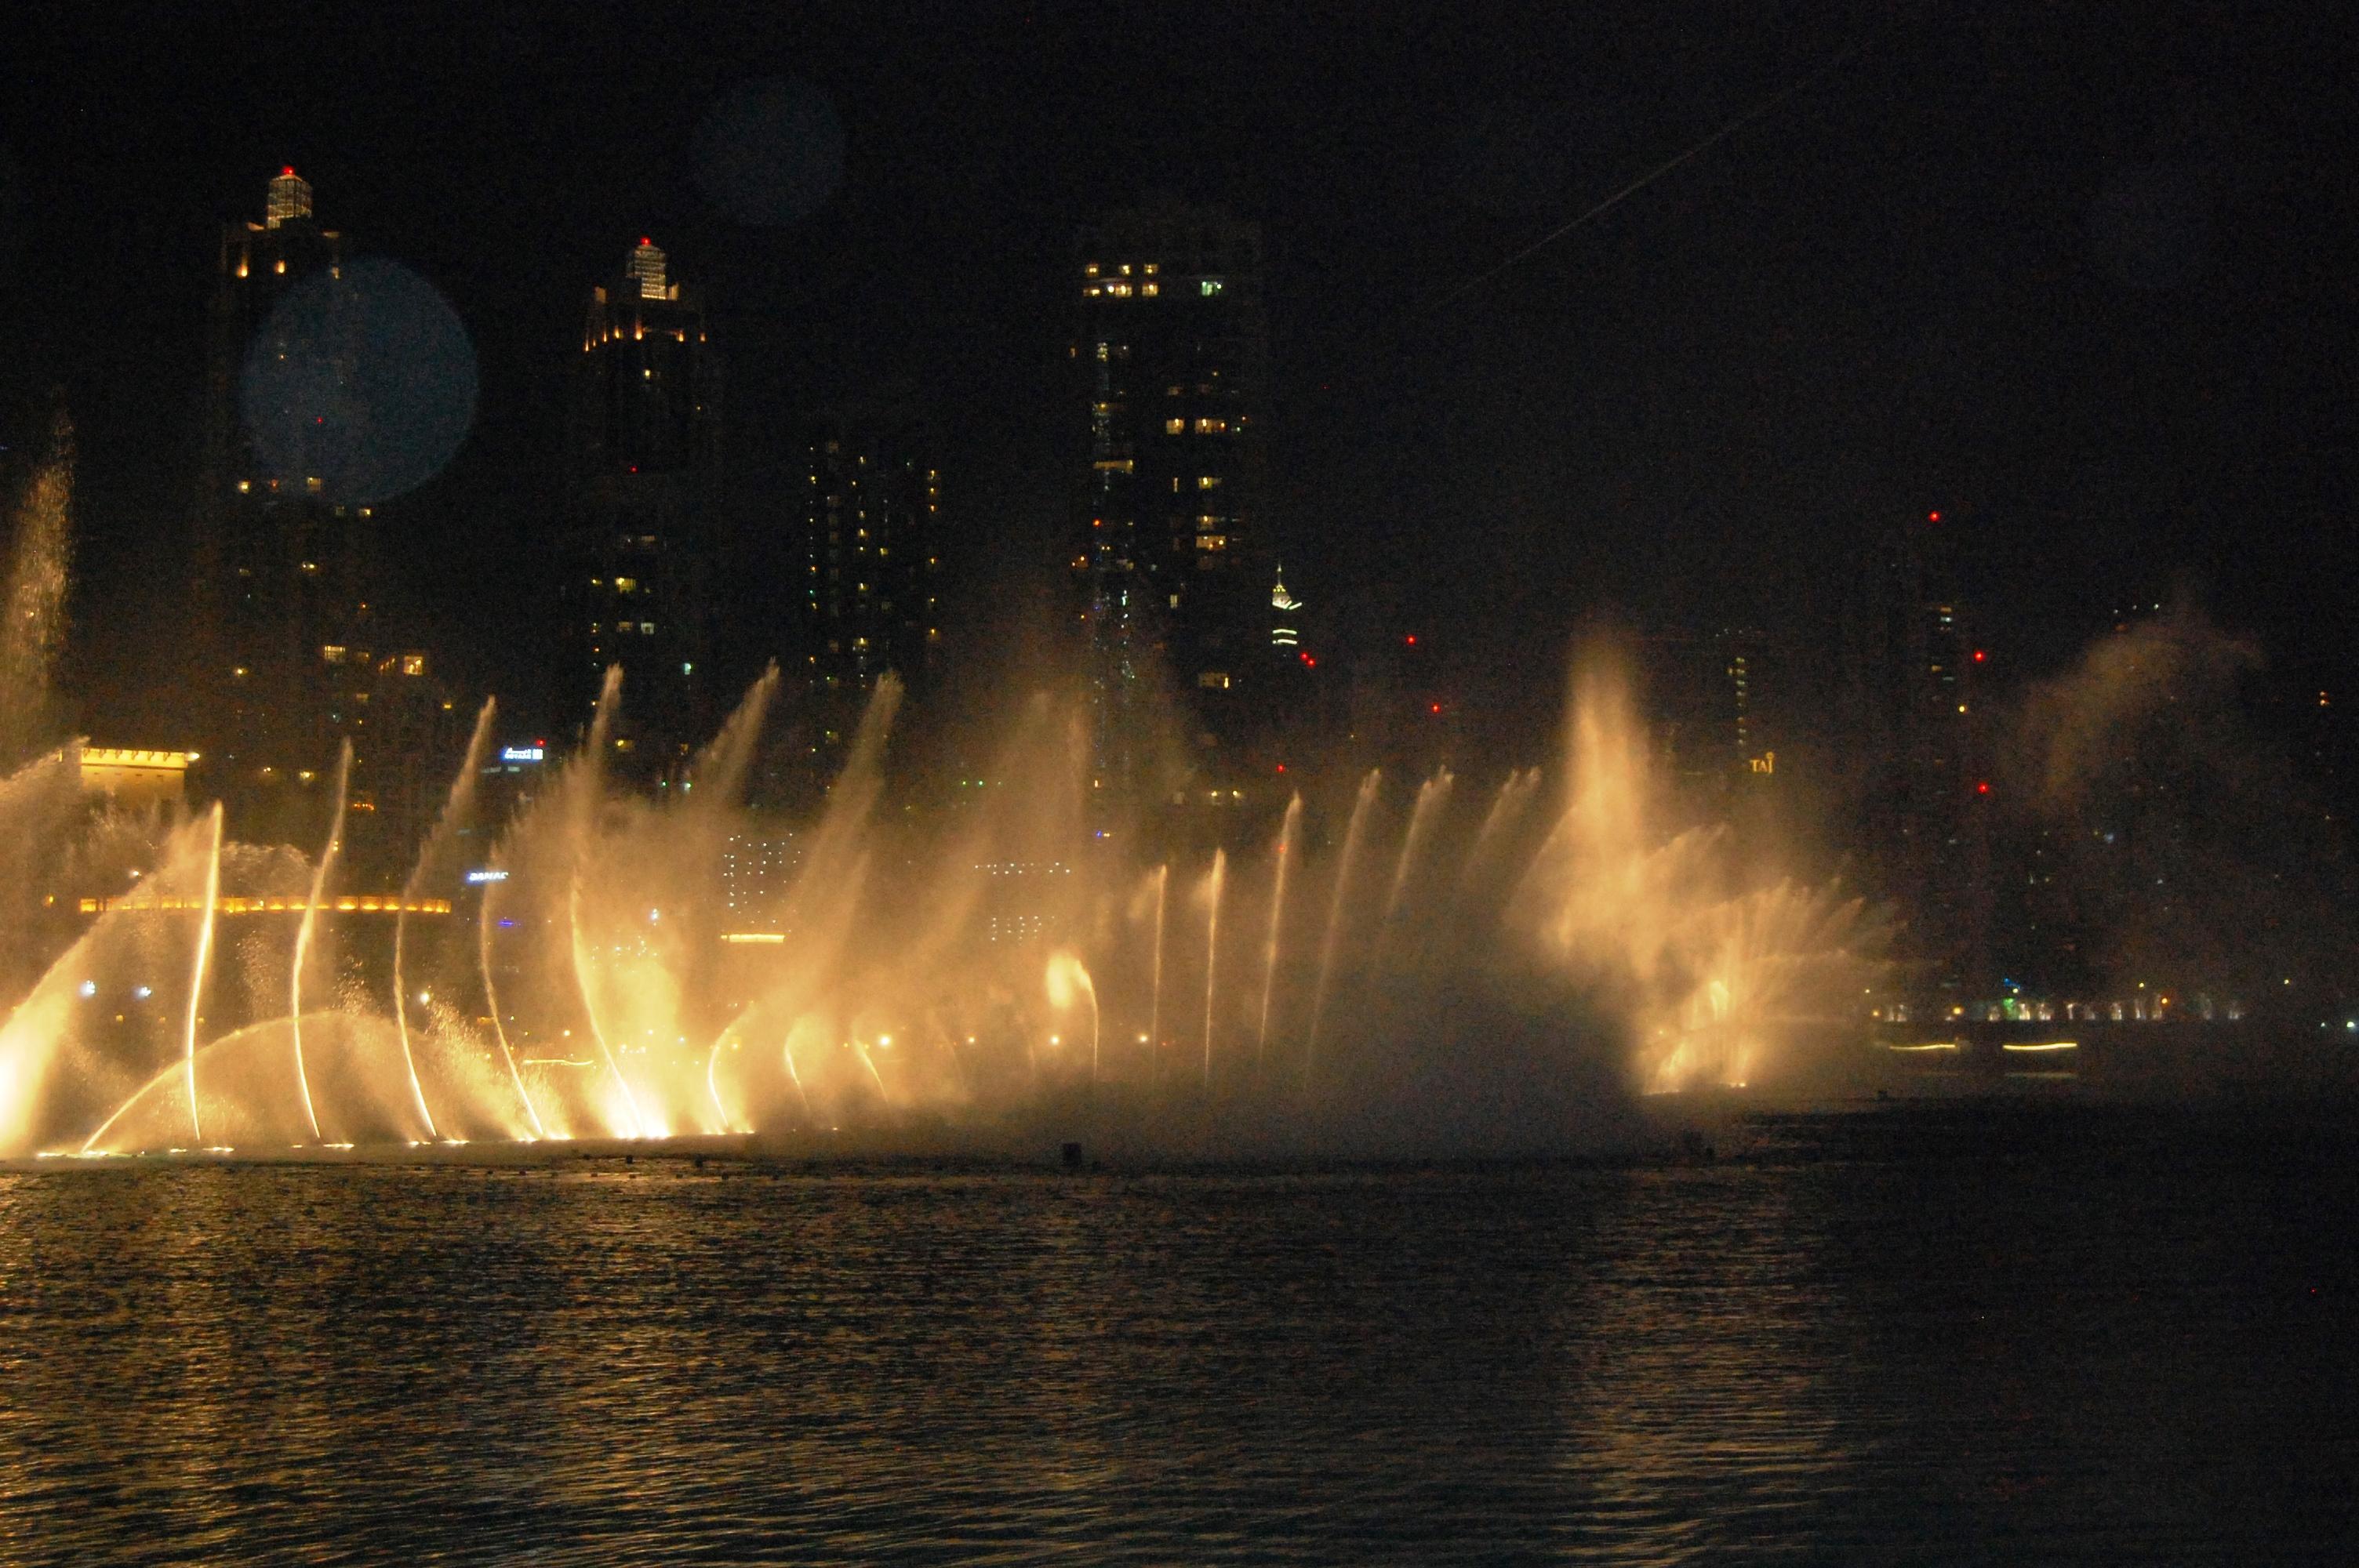 water fountain show at dubai mall